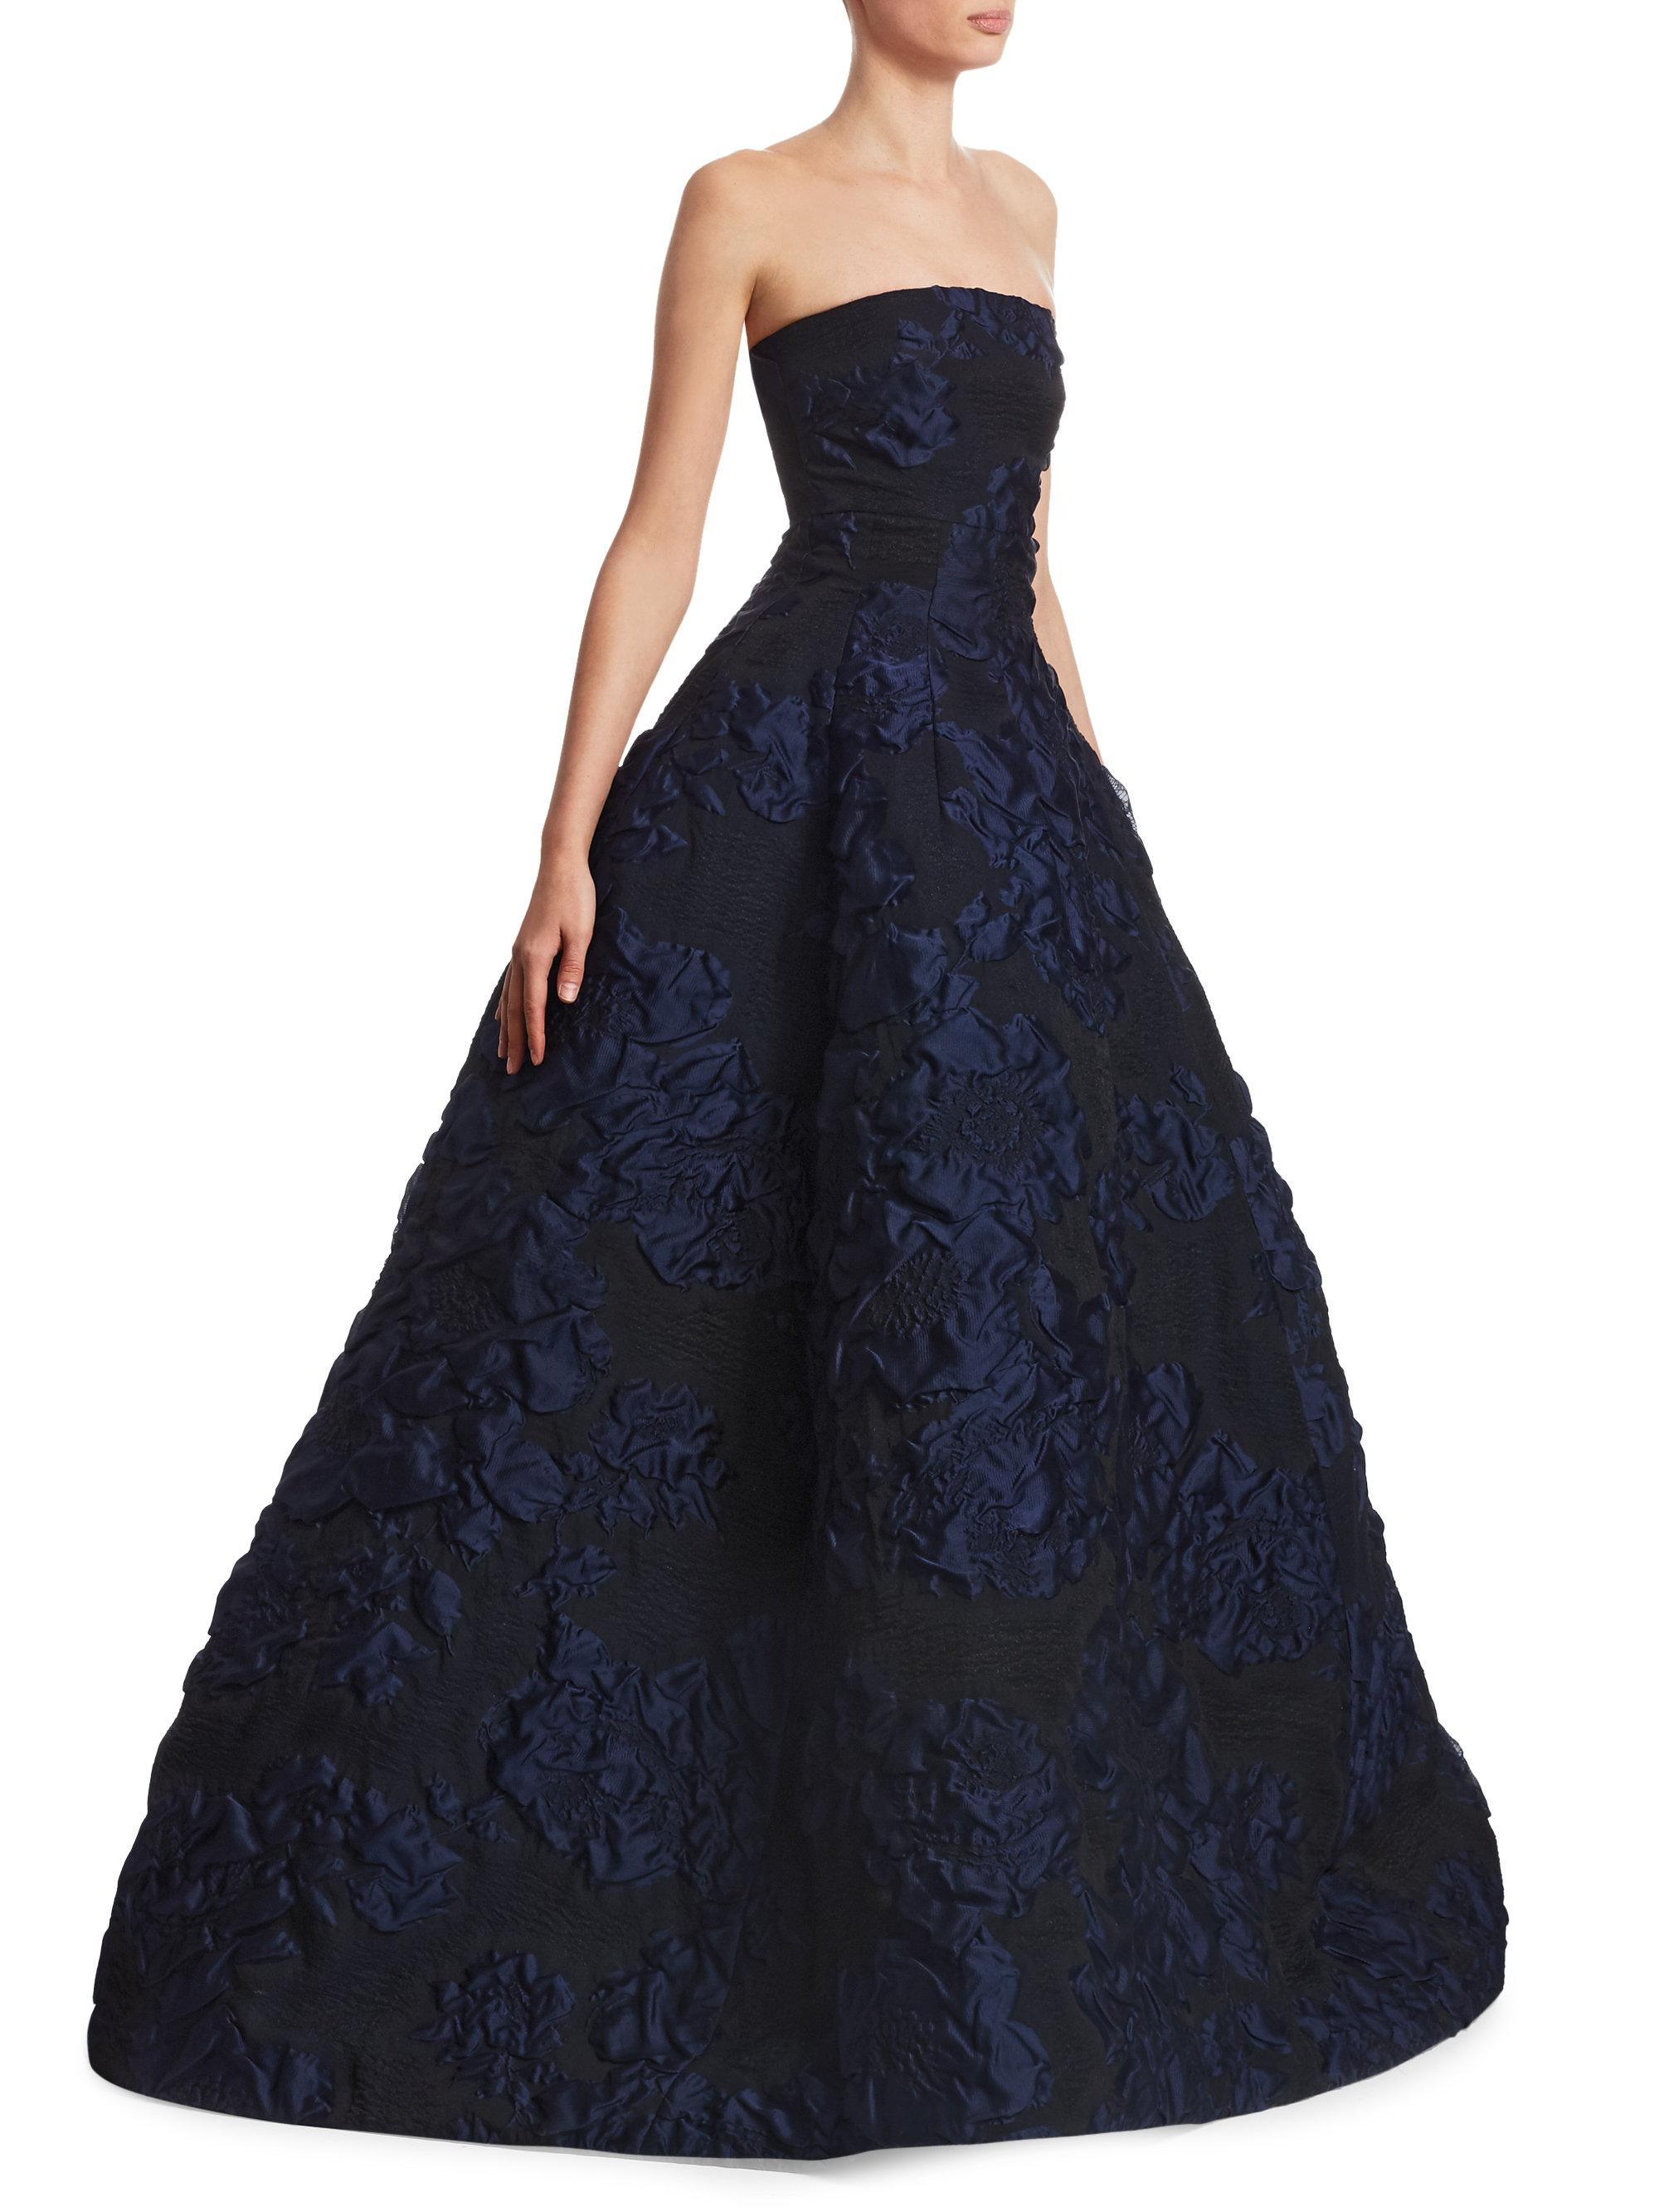 To acquire Renta de la oscar evening gowns pictures trends